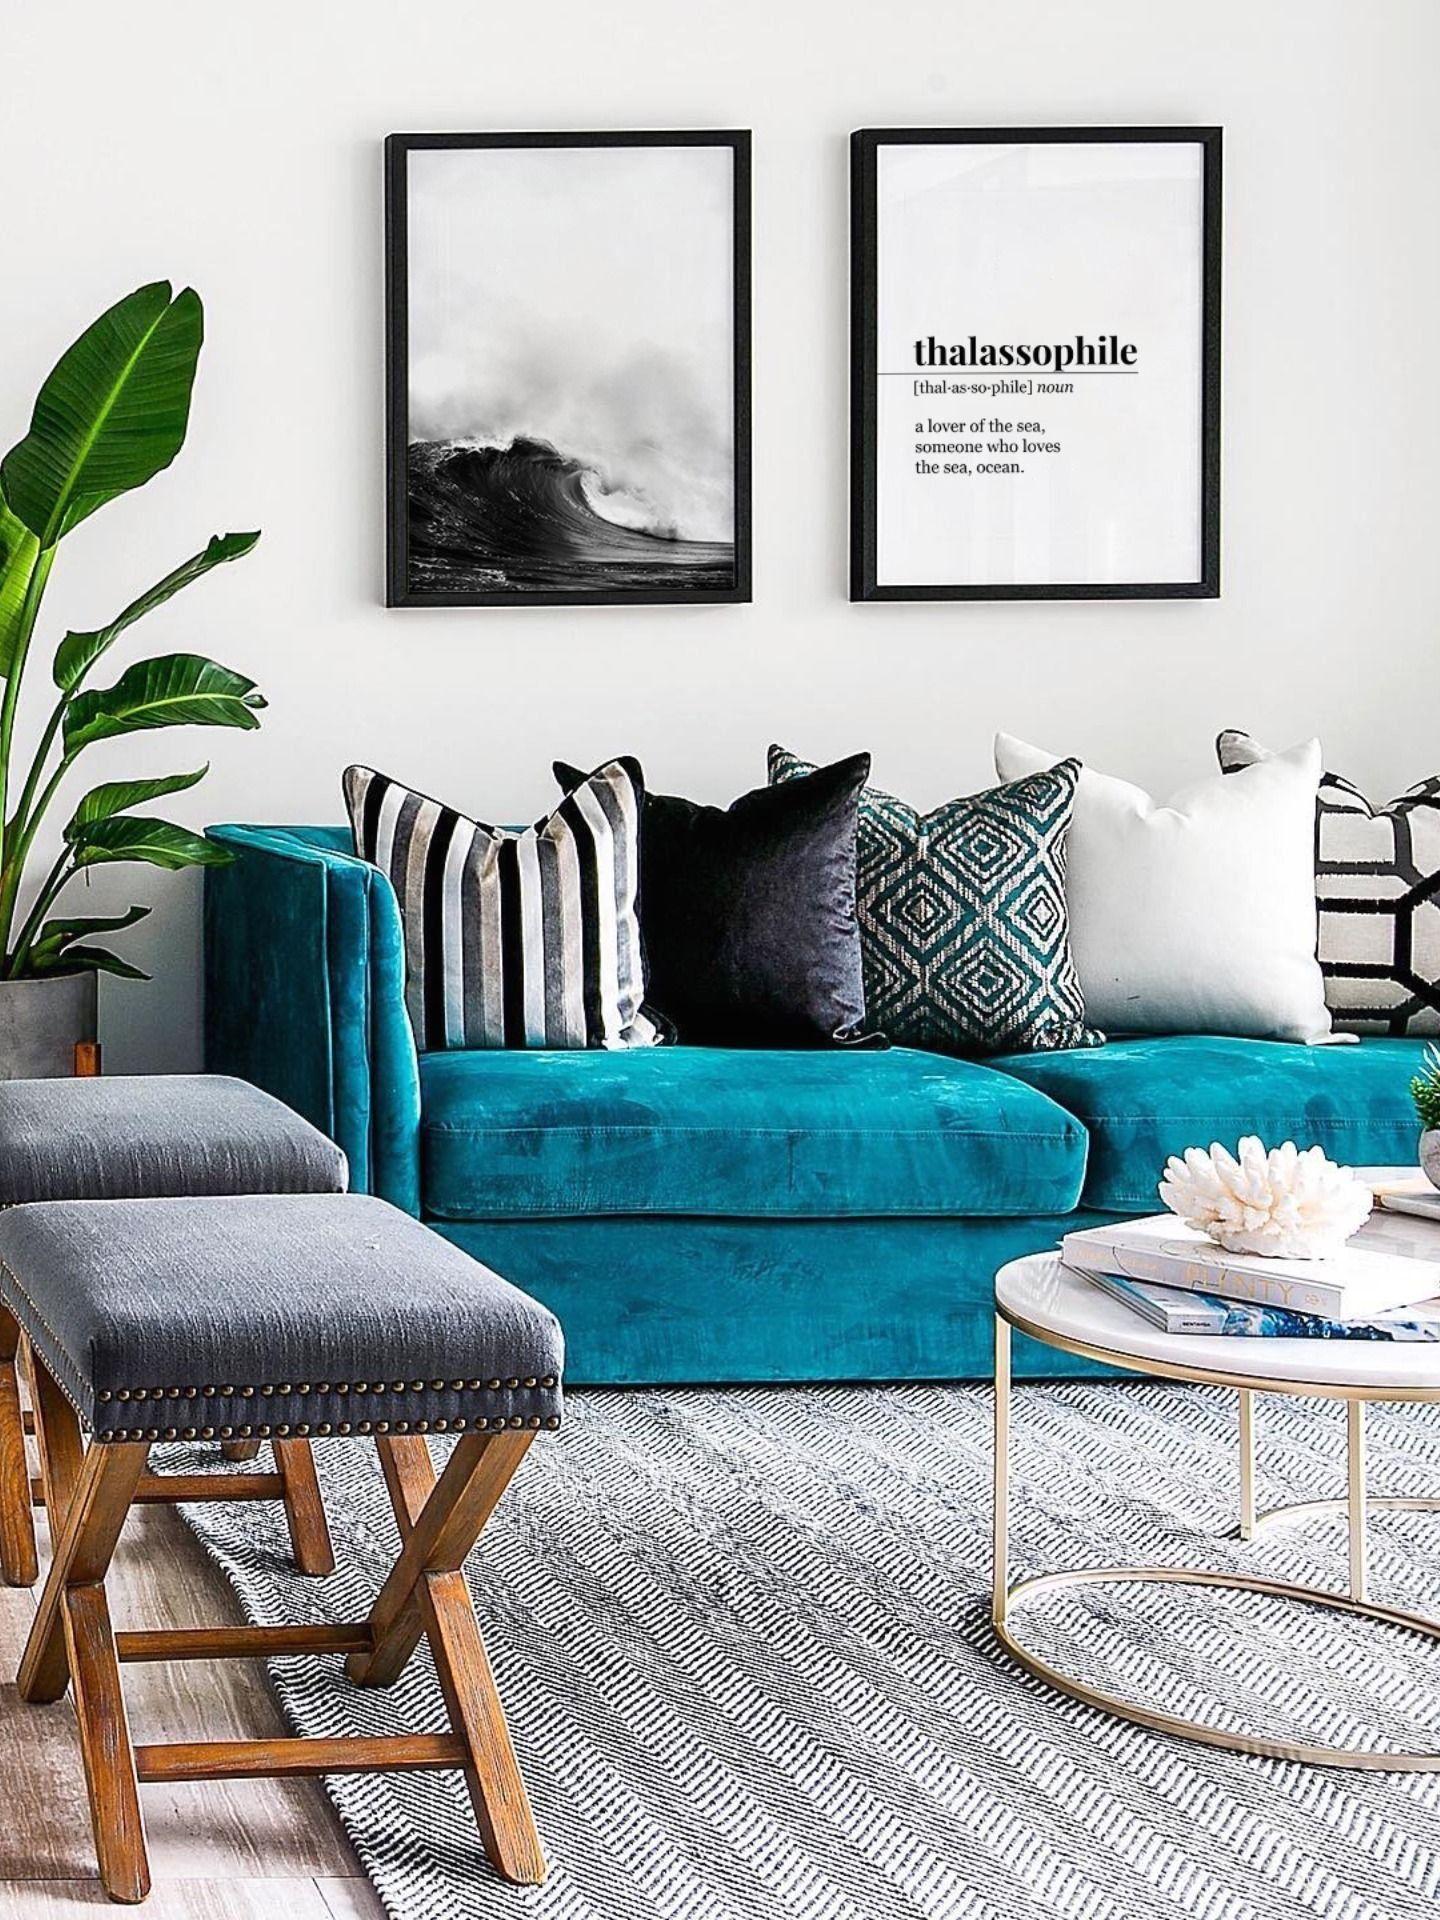 Coastal Decor Thalassophile Definition Black Wave Poster Sea Lover Ocean Lover Gift In 2020 Living Room Turquoise Teal Sofa Living Room Turquoise Living Room Decor